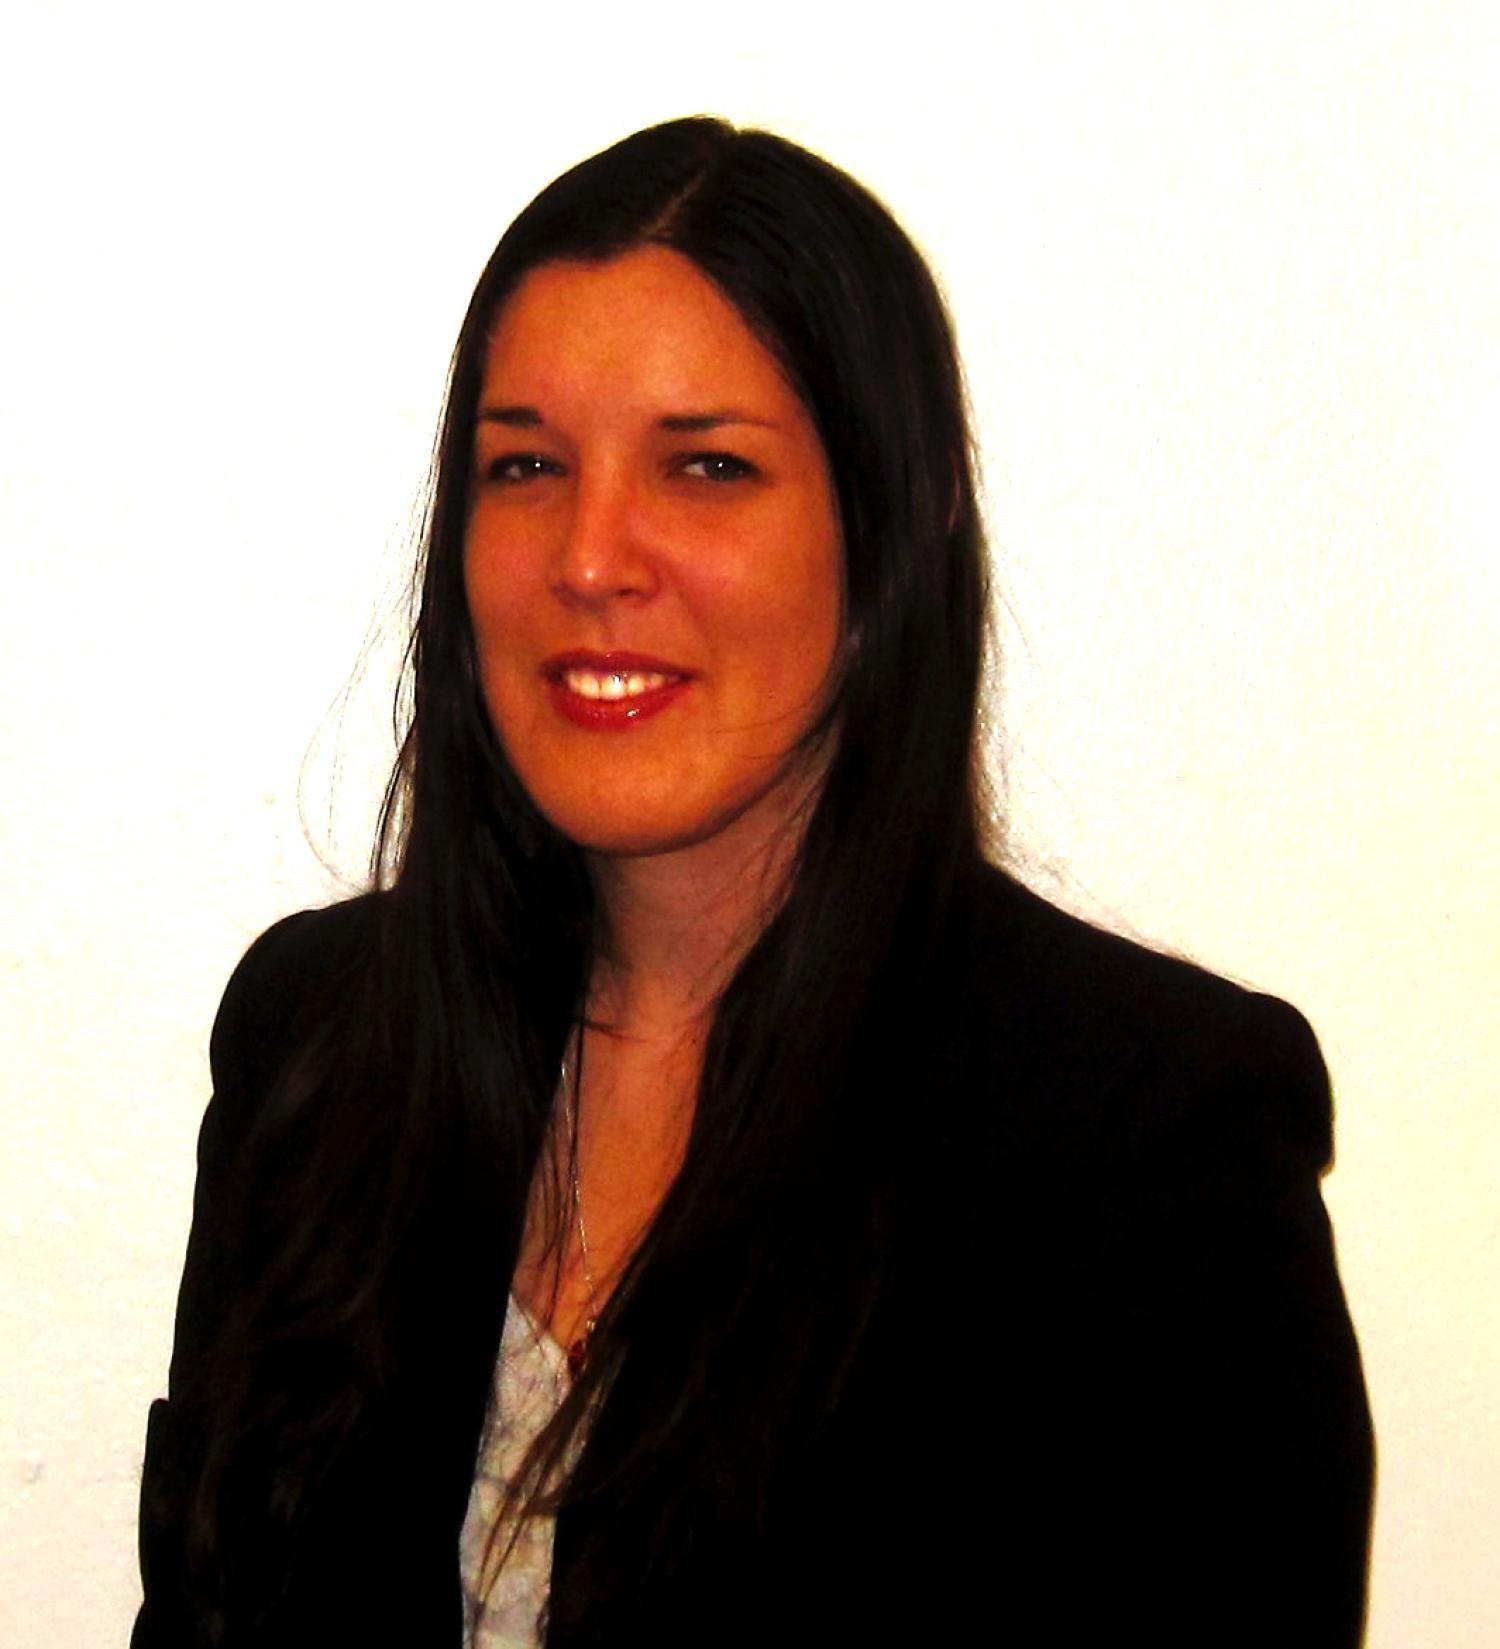 Megan Coontz McAllister